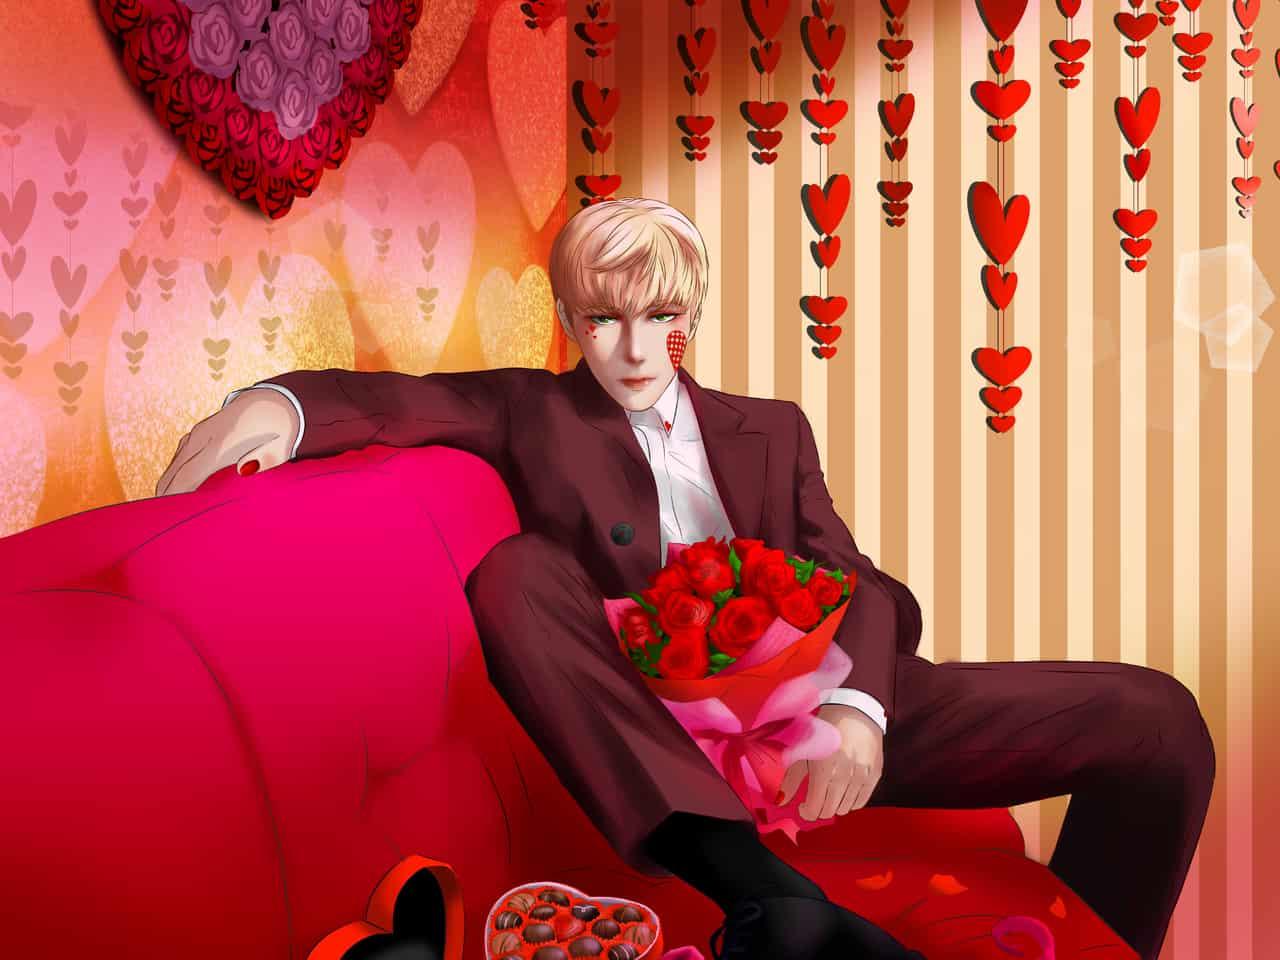 My Valentine Illust of erize04 Feb2020:VDAY roses pink valentines hearts chocolates